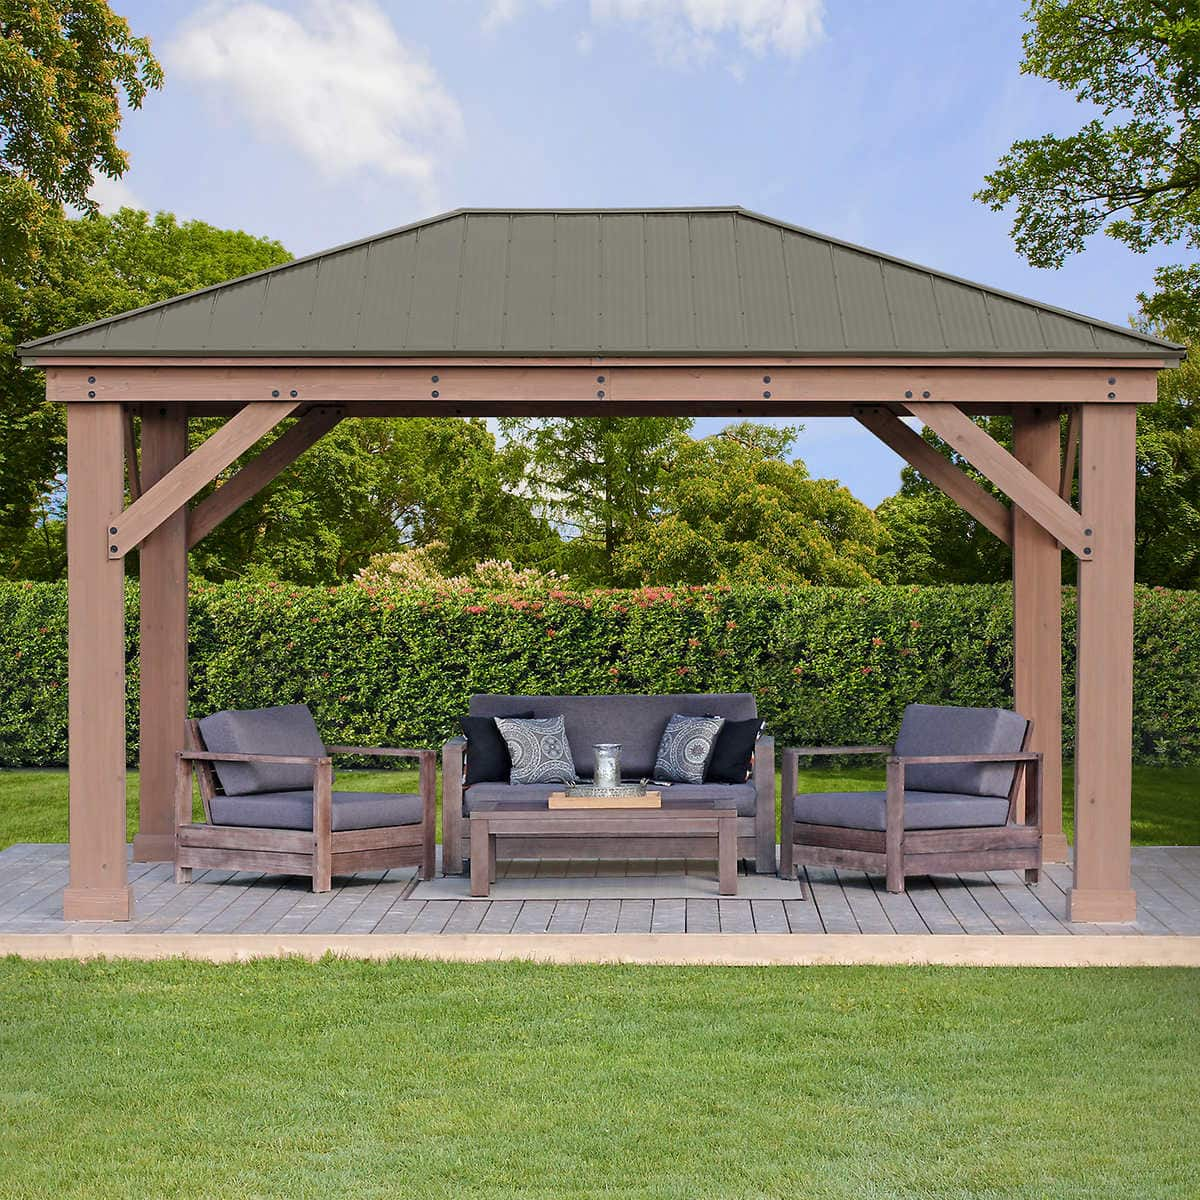 12' x 16' Cedar Gazebo with Aluminum Roof $1799.99